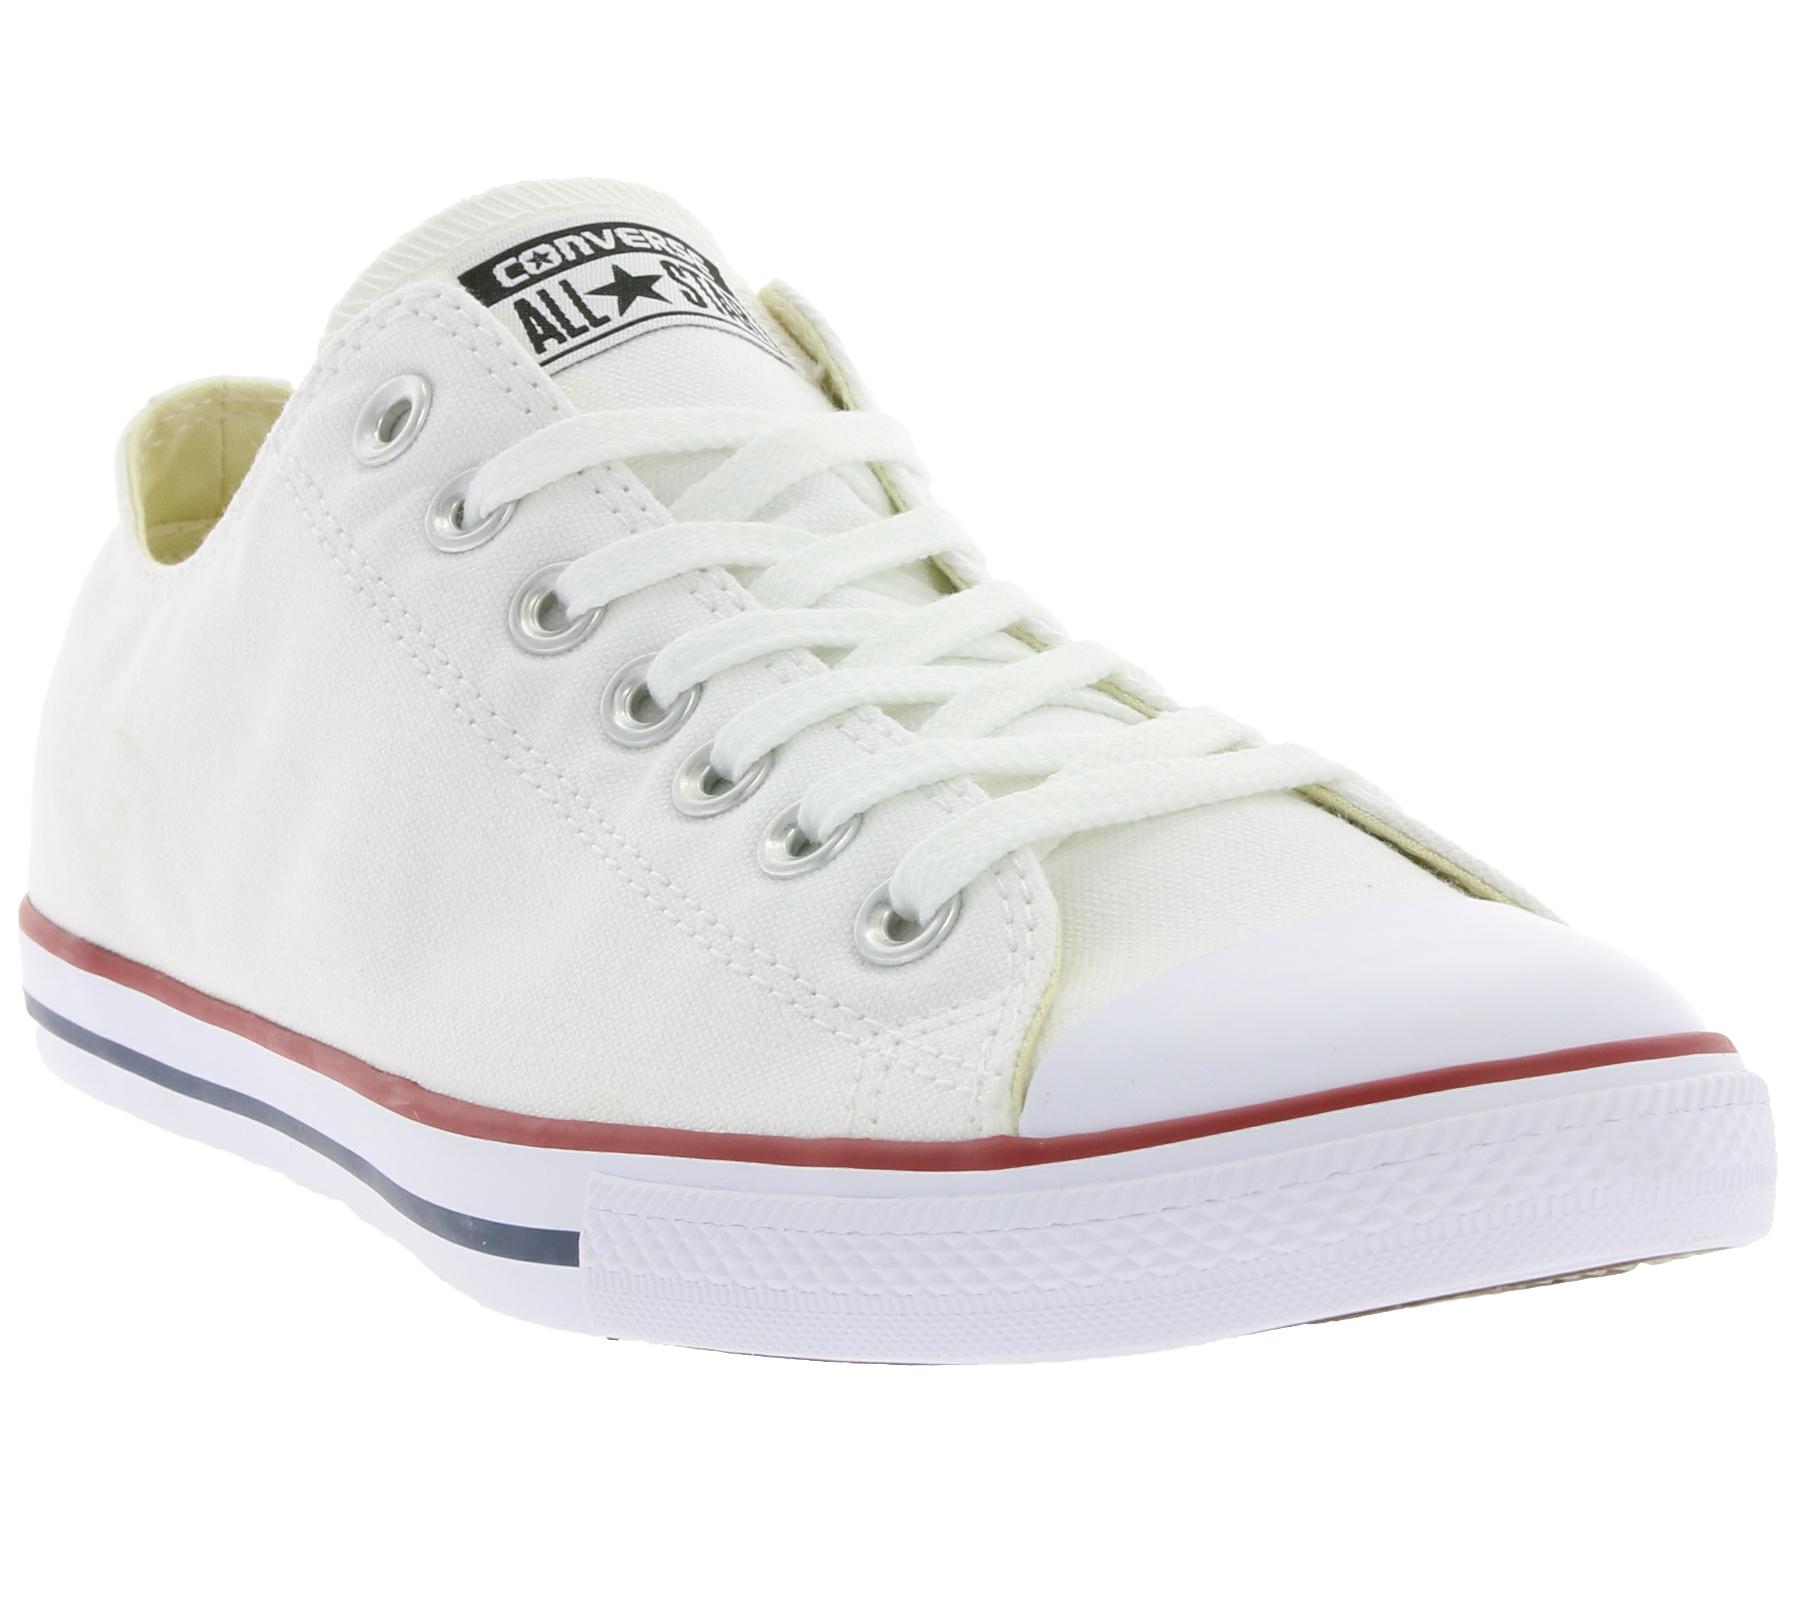 Converse Chuck Taylor All Star Lean Ox Sneaker Weiß